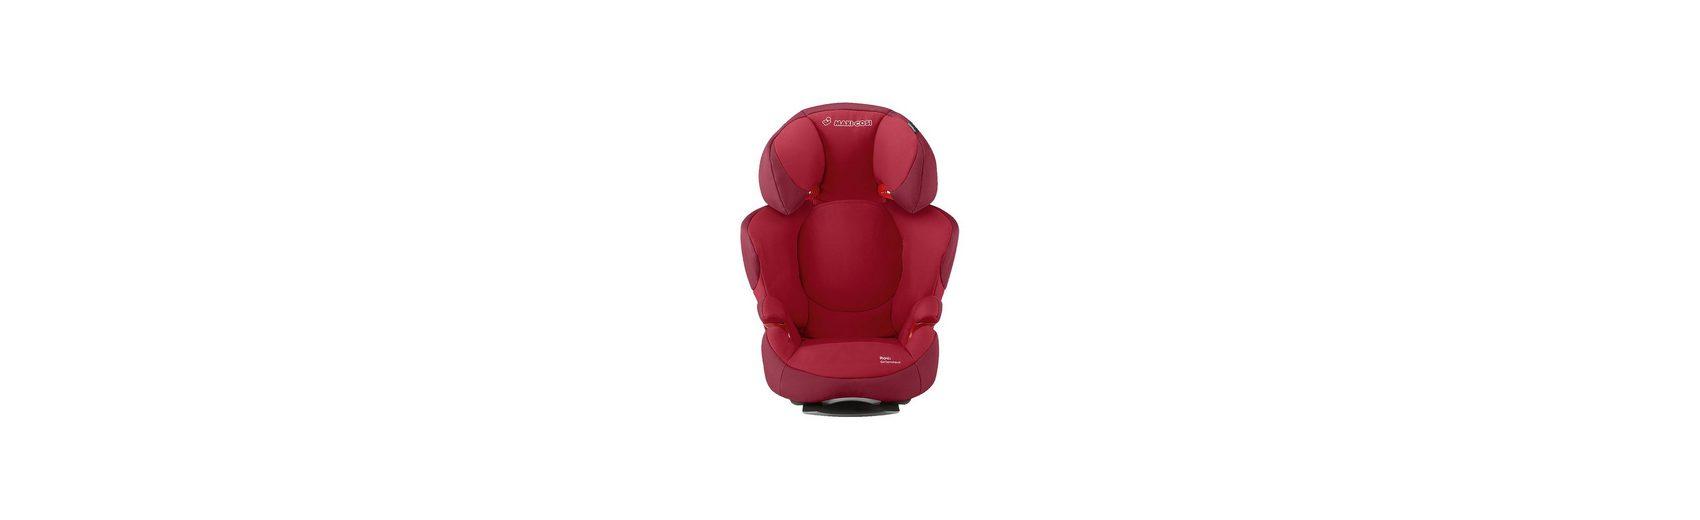 Maxi-Cosi Auto-Kindersitz Rodi AirProtect, Robin Red, 2017